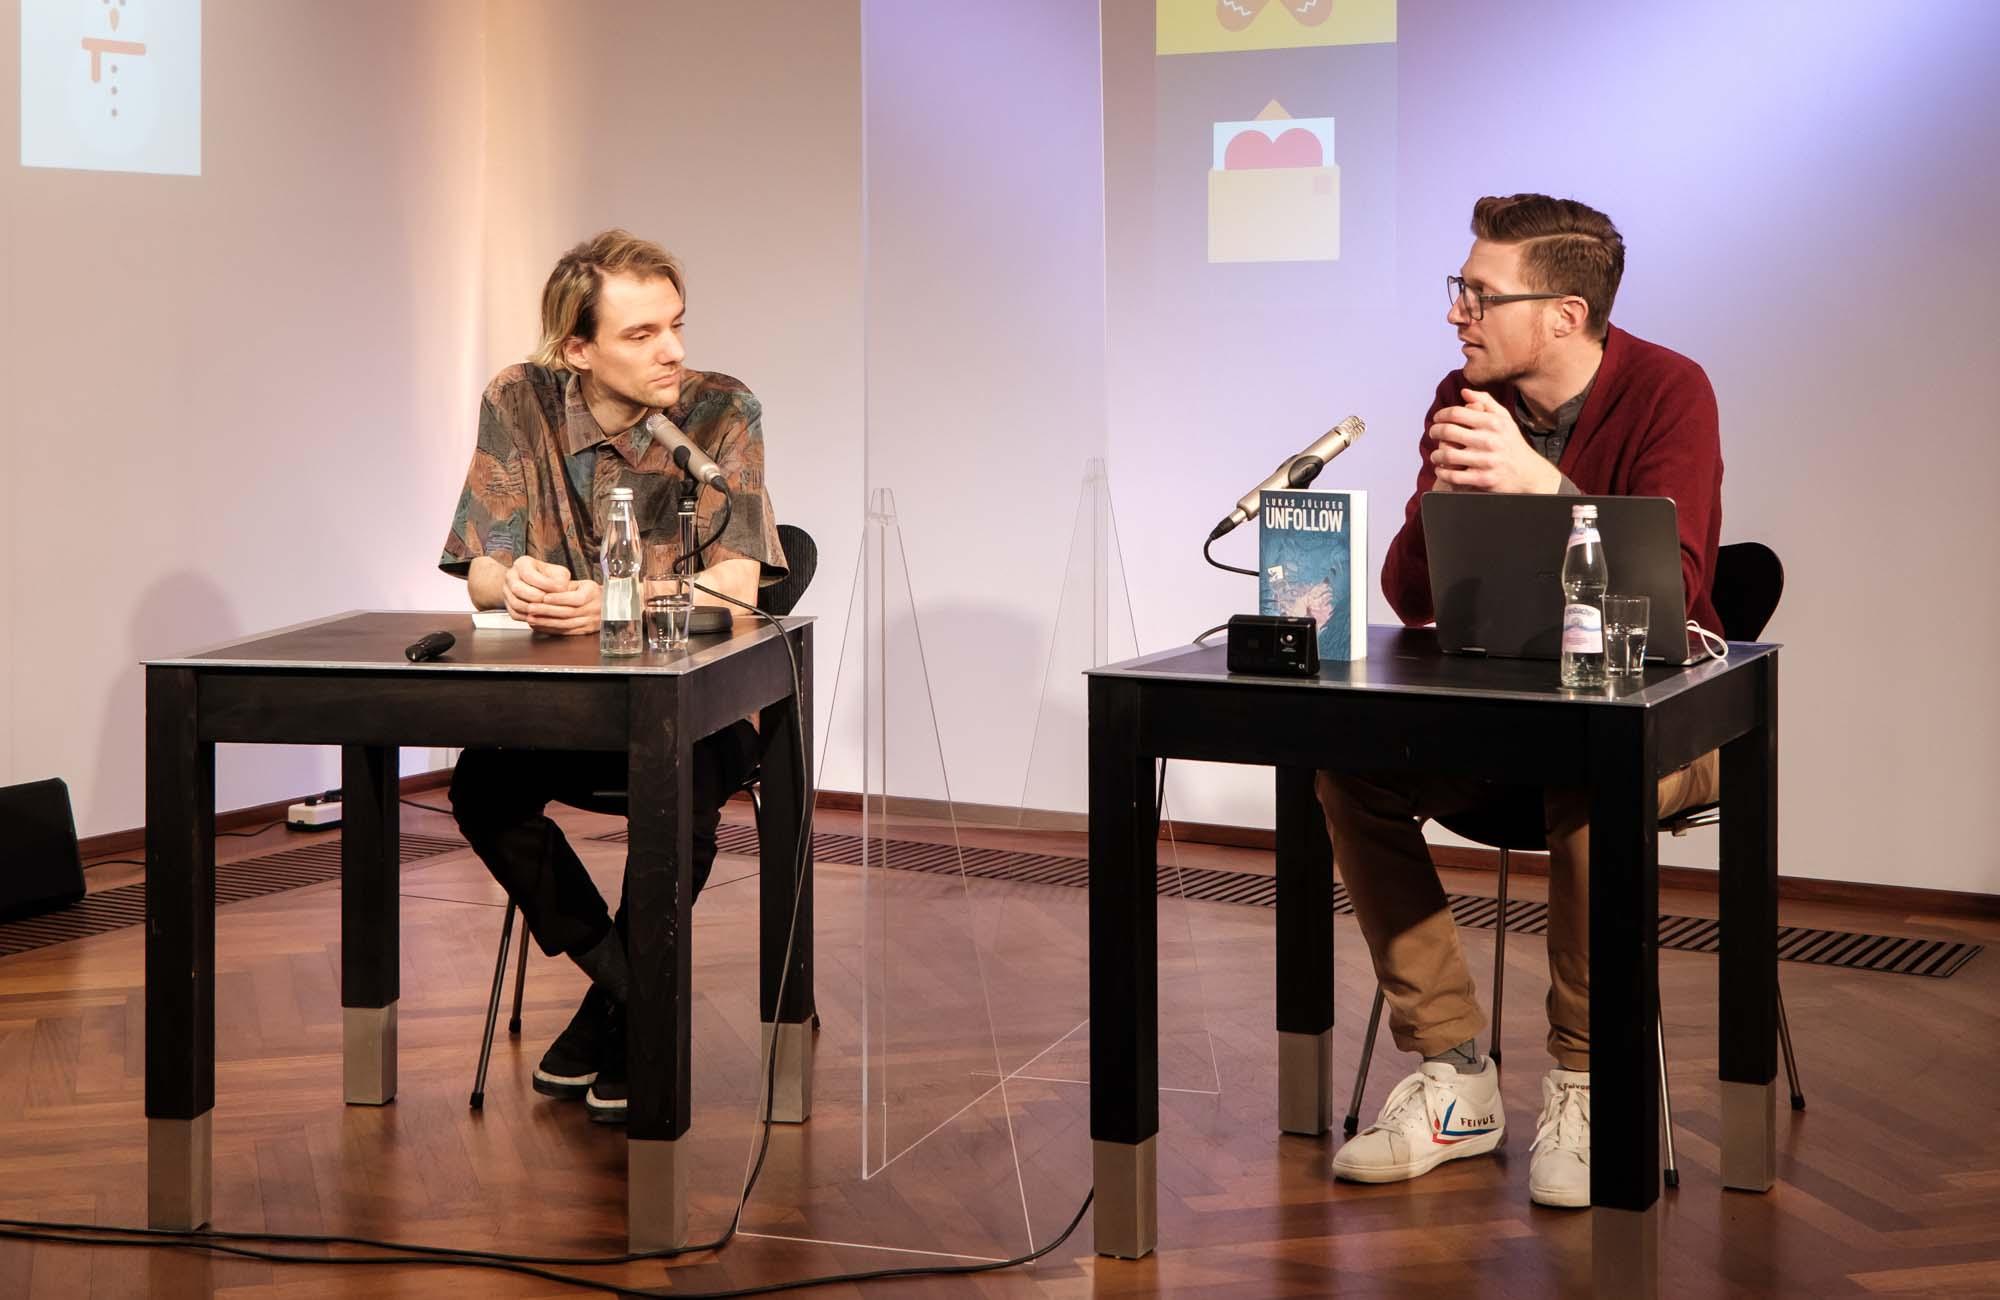 Lukas Jüliger: Unfollow <br/>(c) Sebastian Wenzel